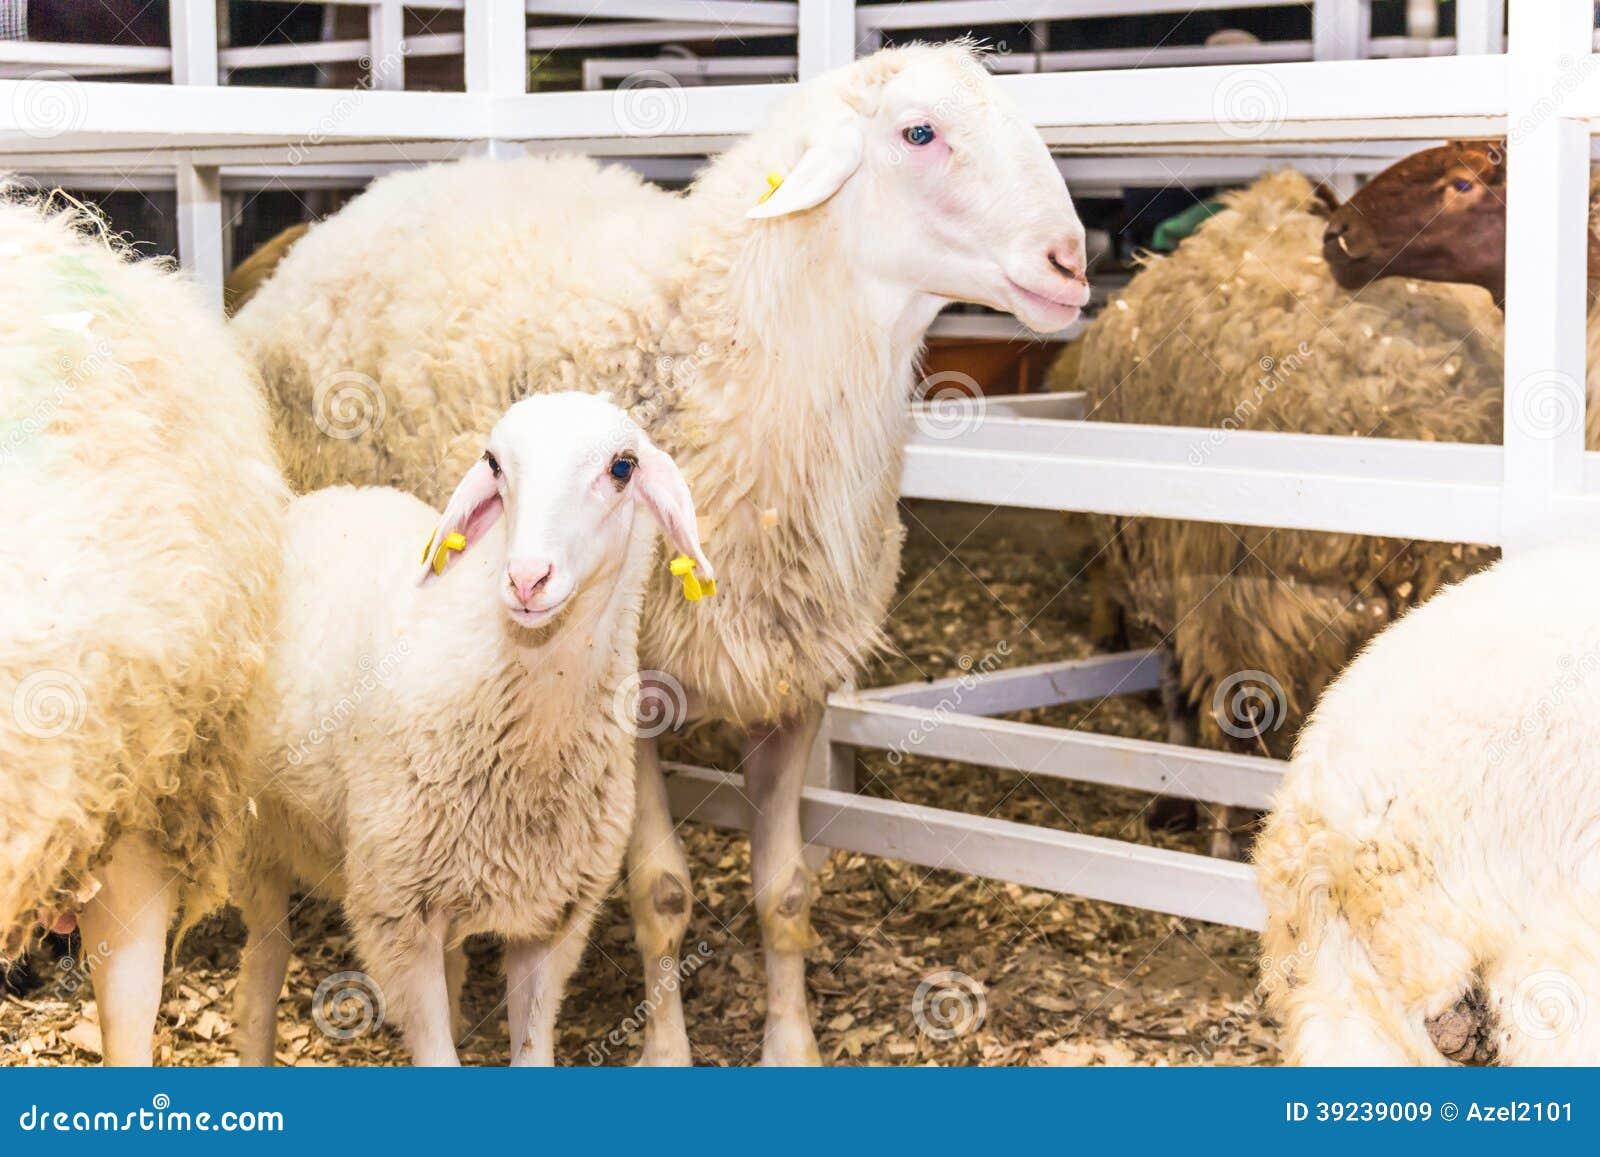 Herd Of Sheep Stock Photo - Image: 39239009